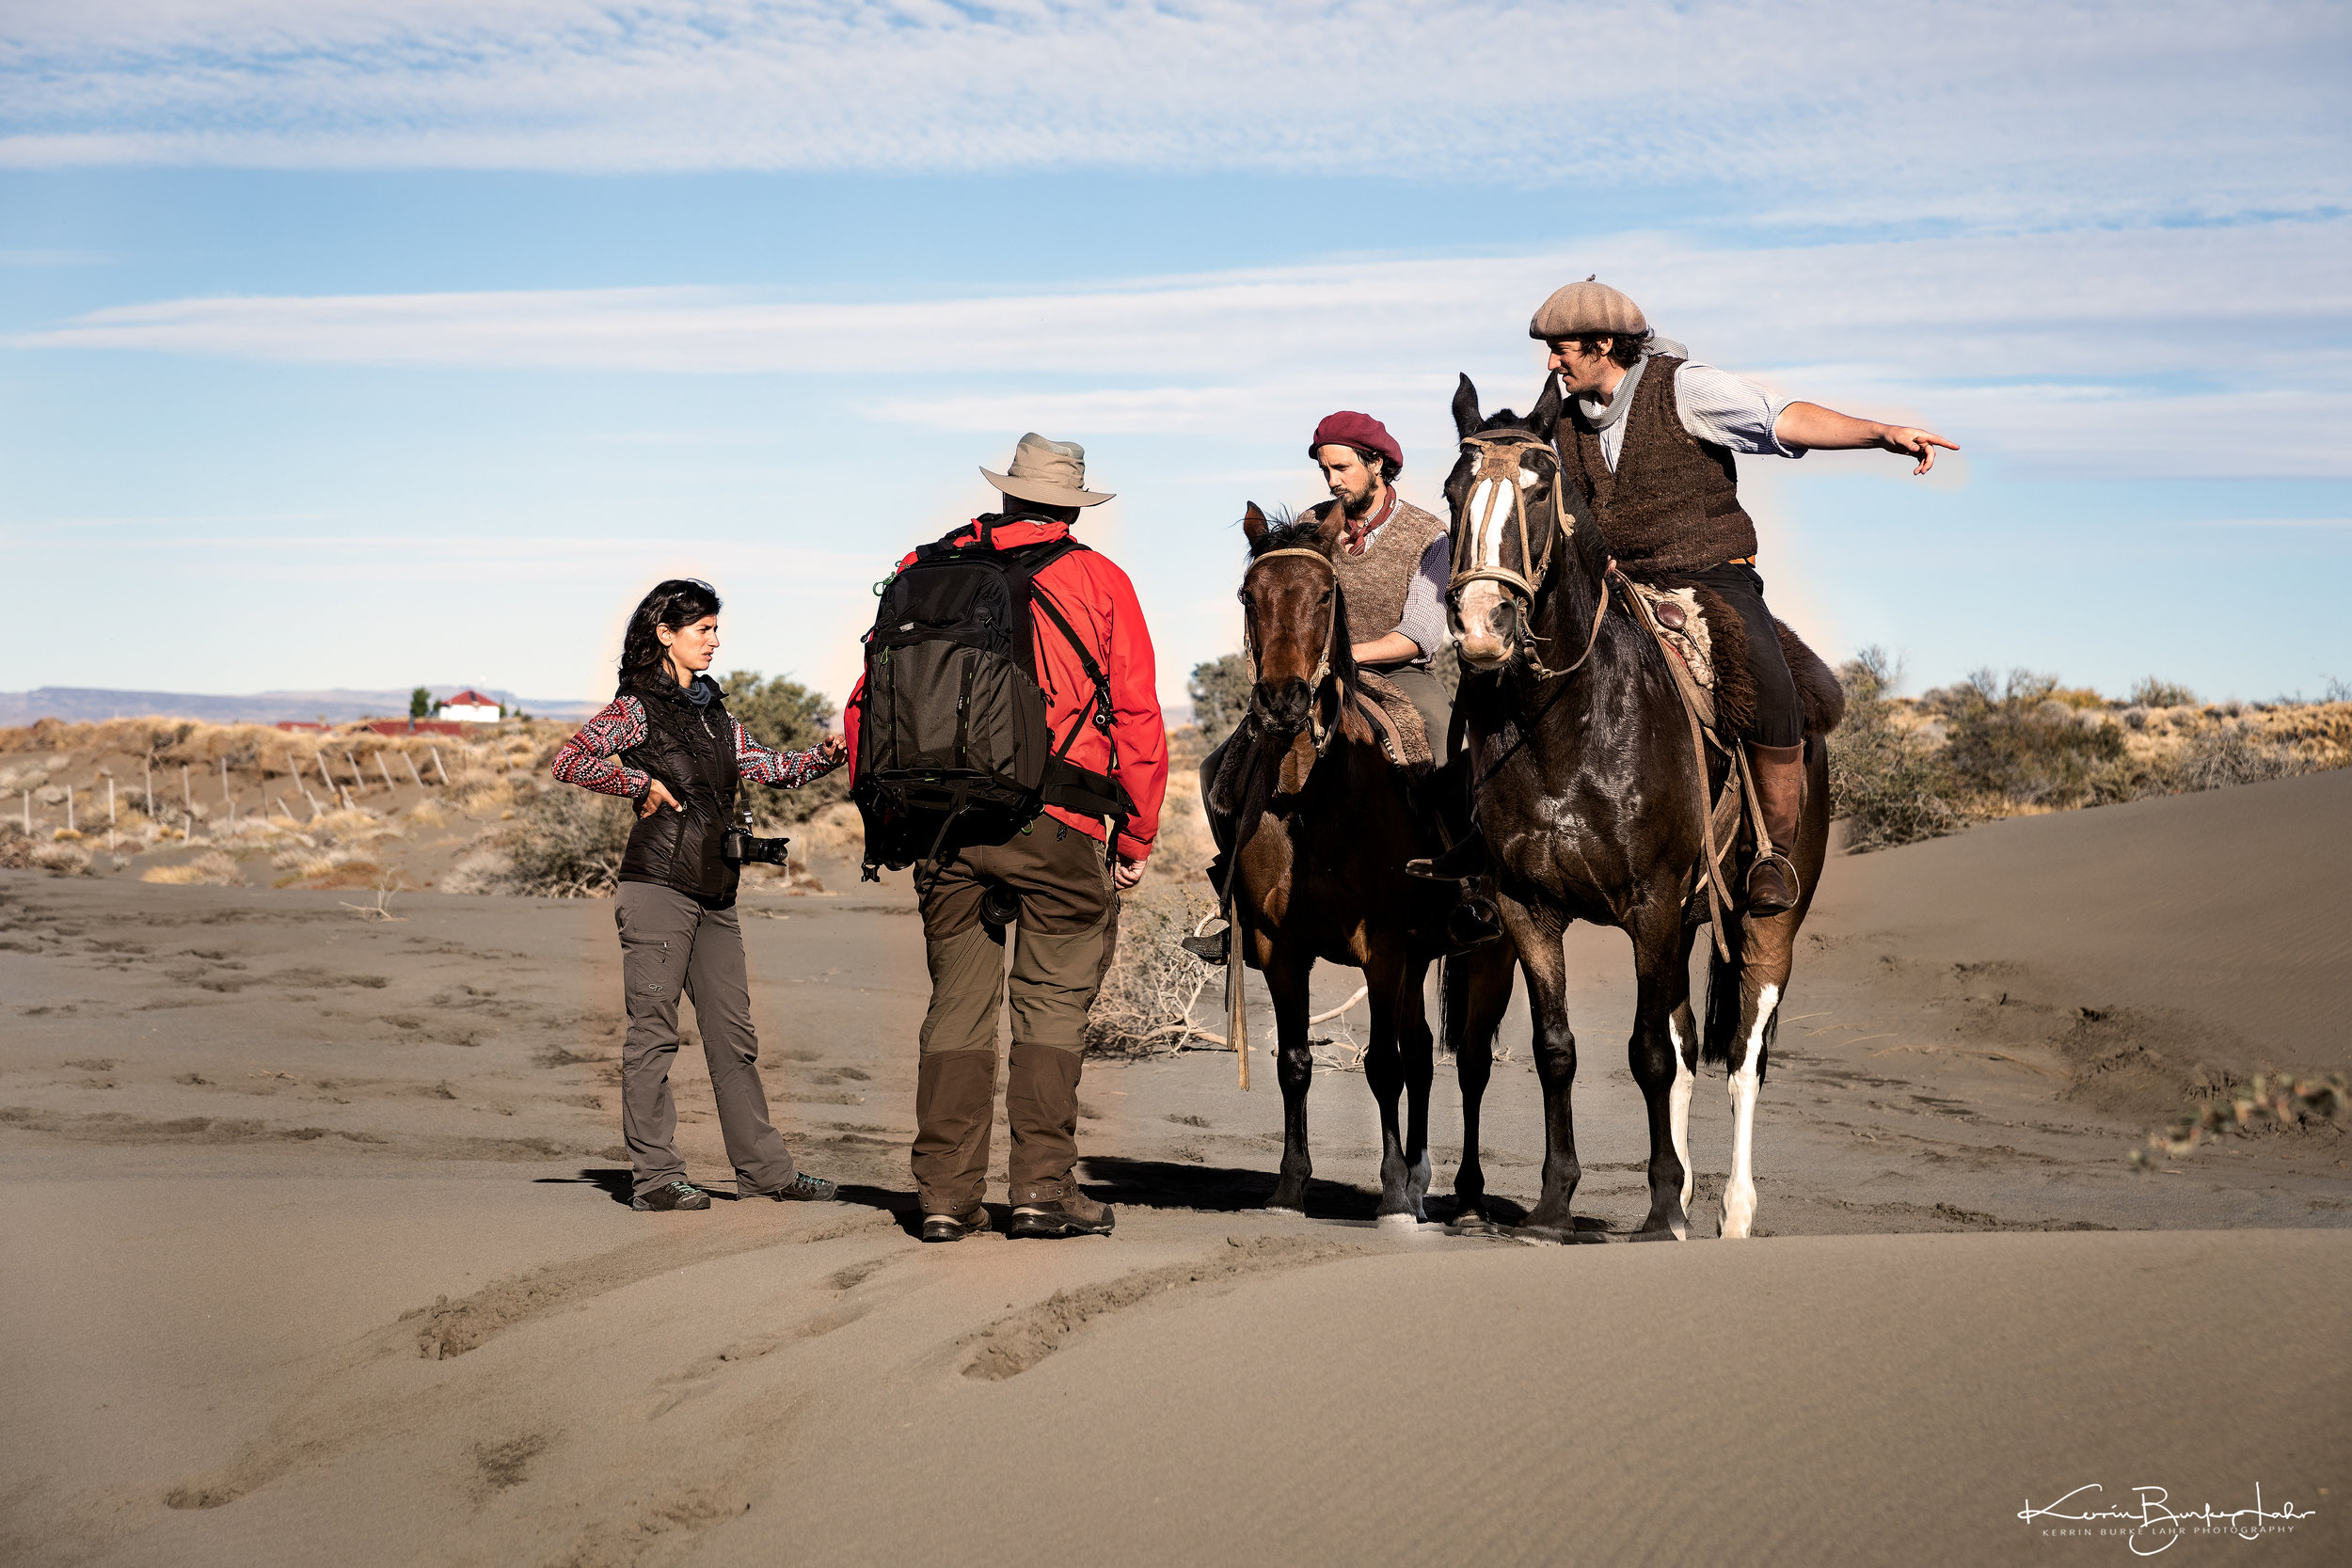 Patagonia-4-7-2019-658.jpg